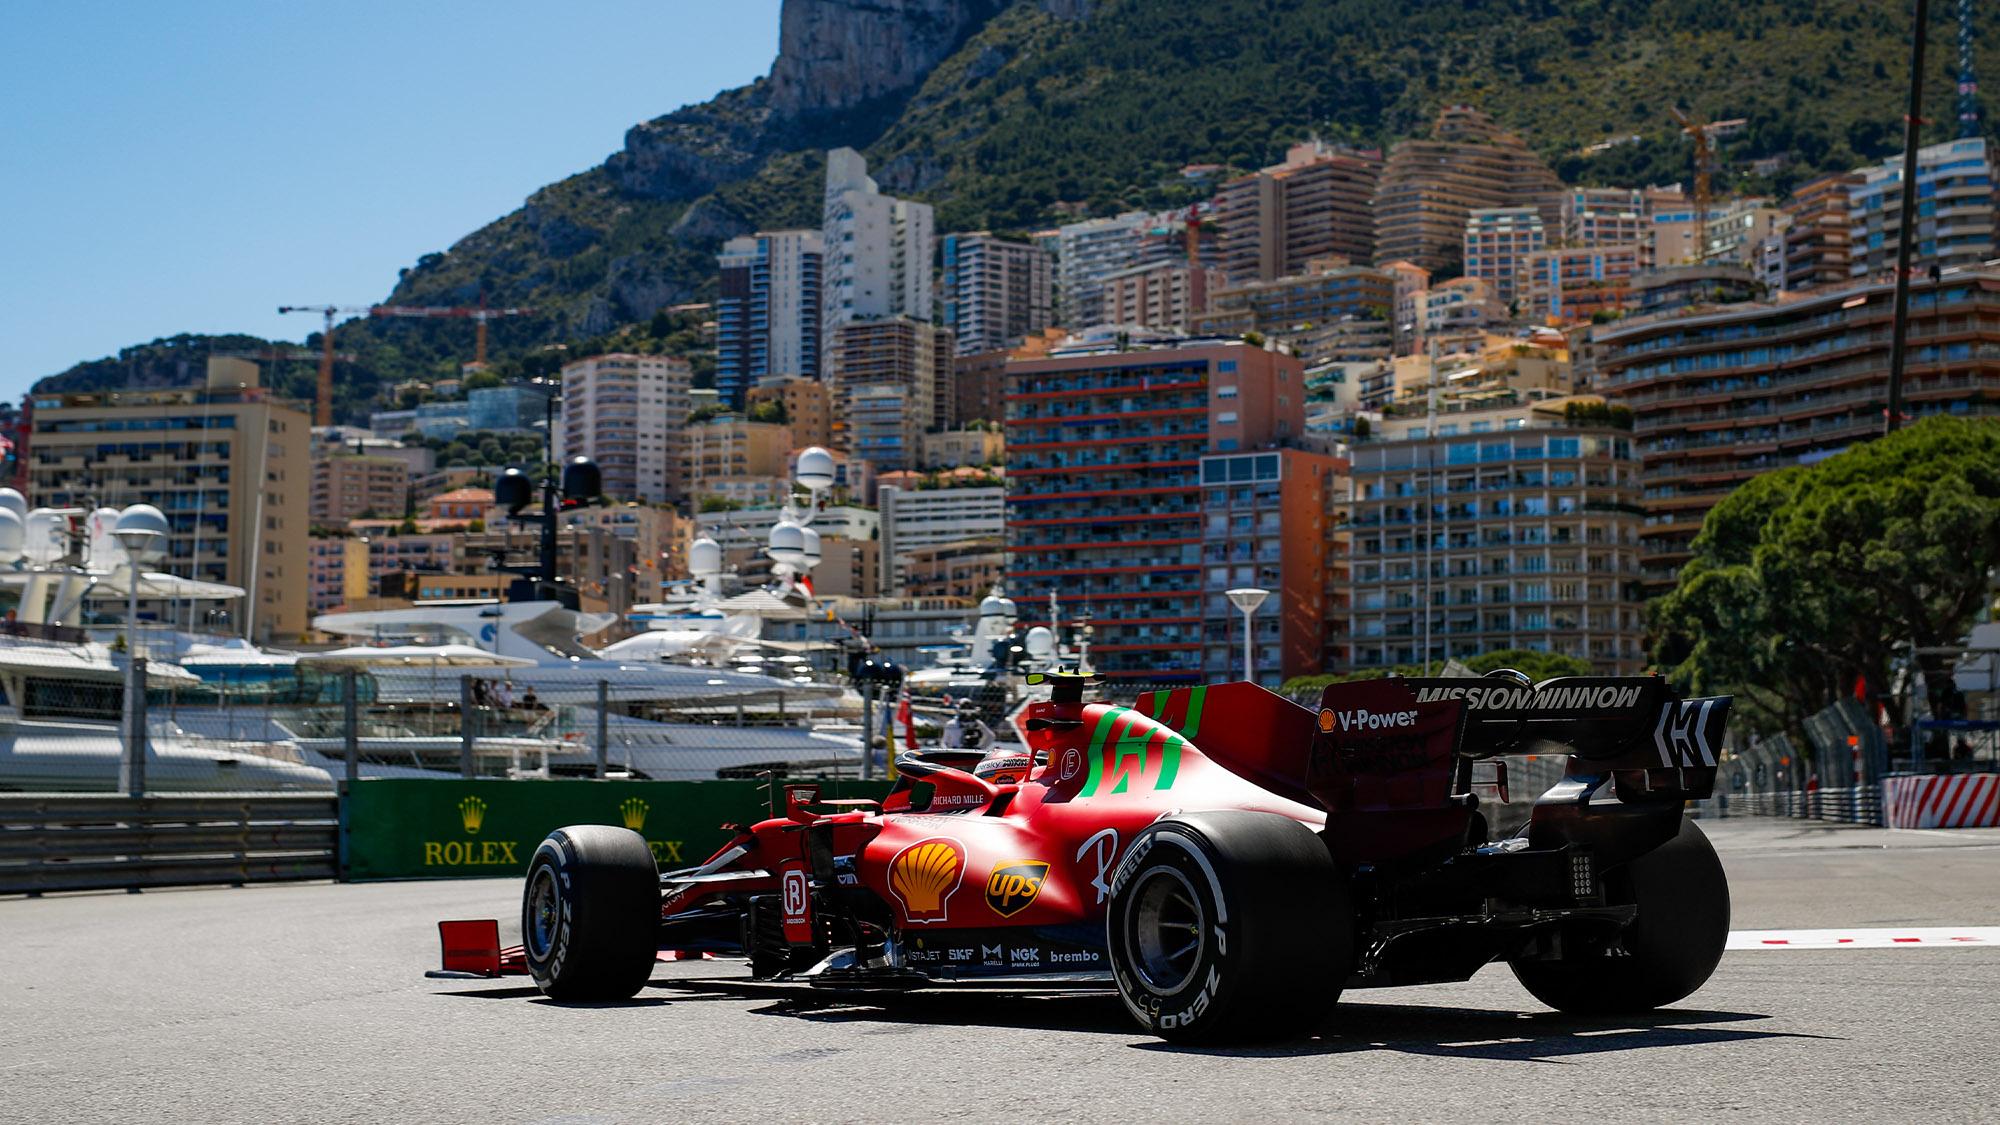 Ferrari of Carlos Sainz during the 2021 Monaco Grand Prix